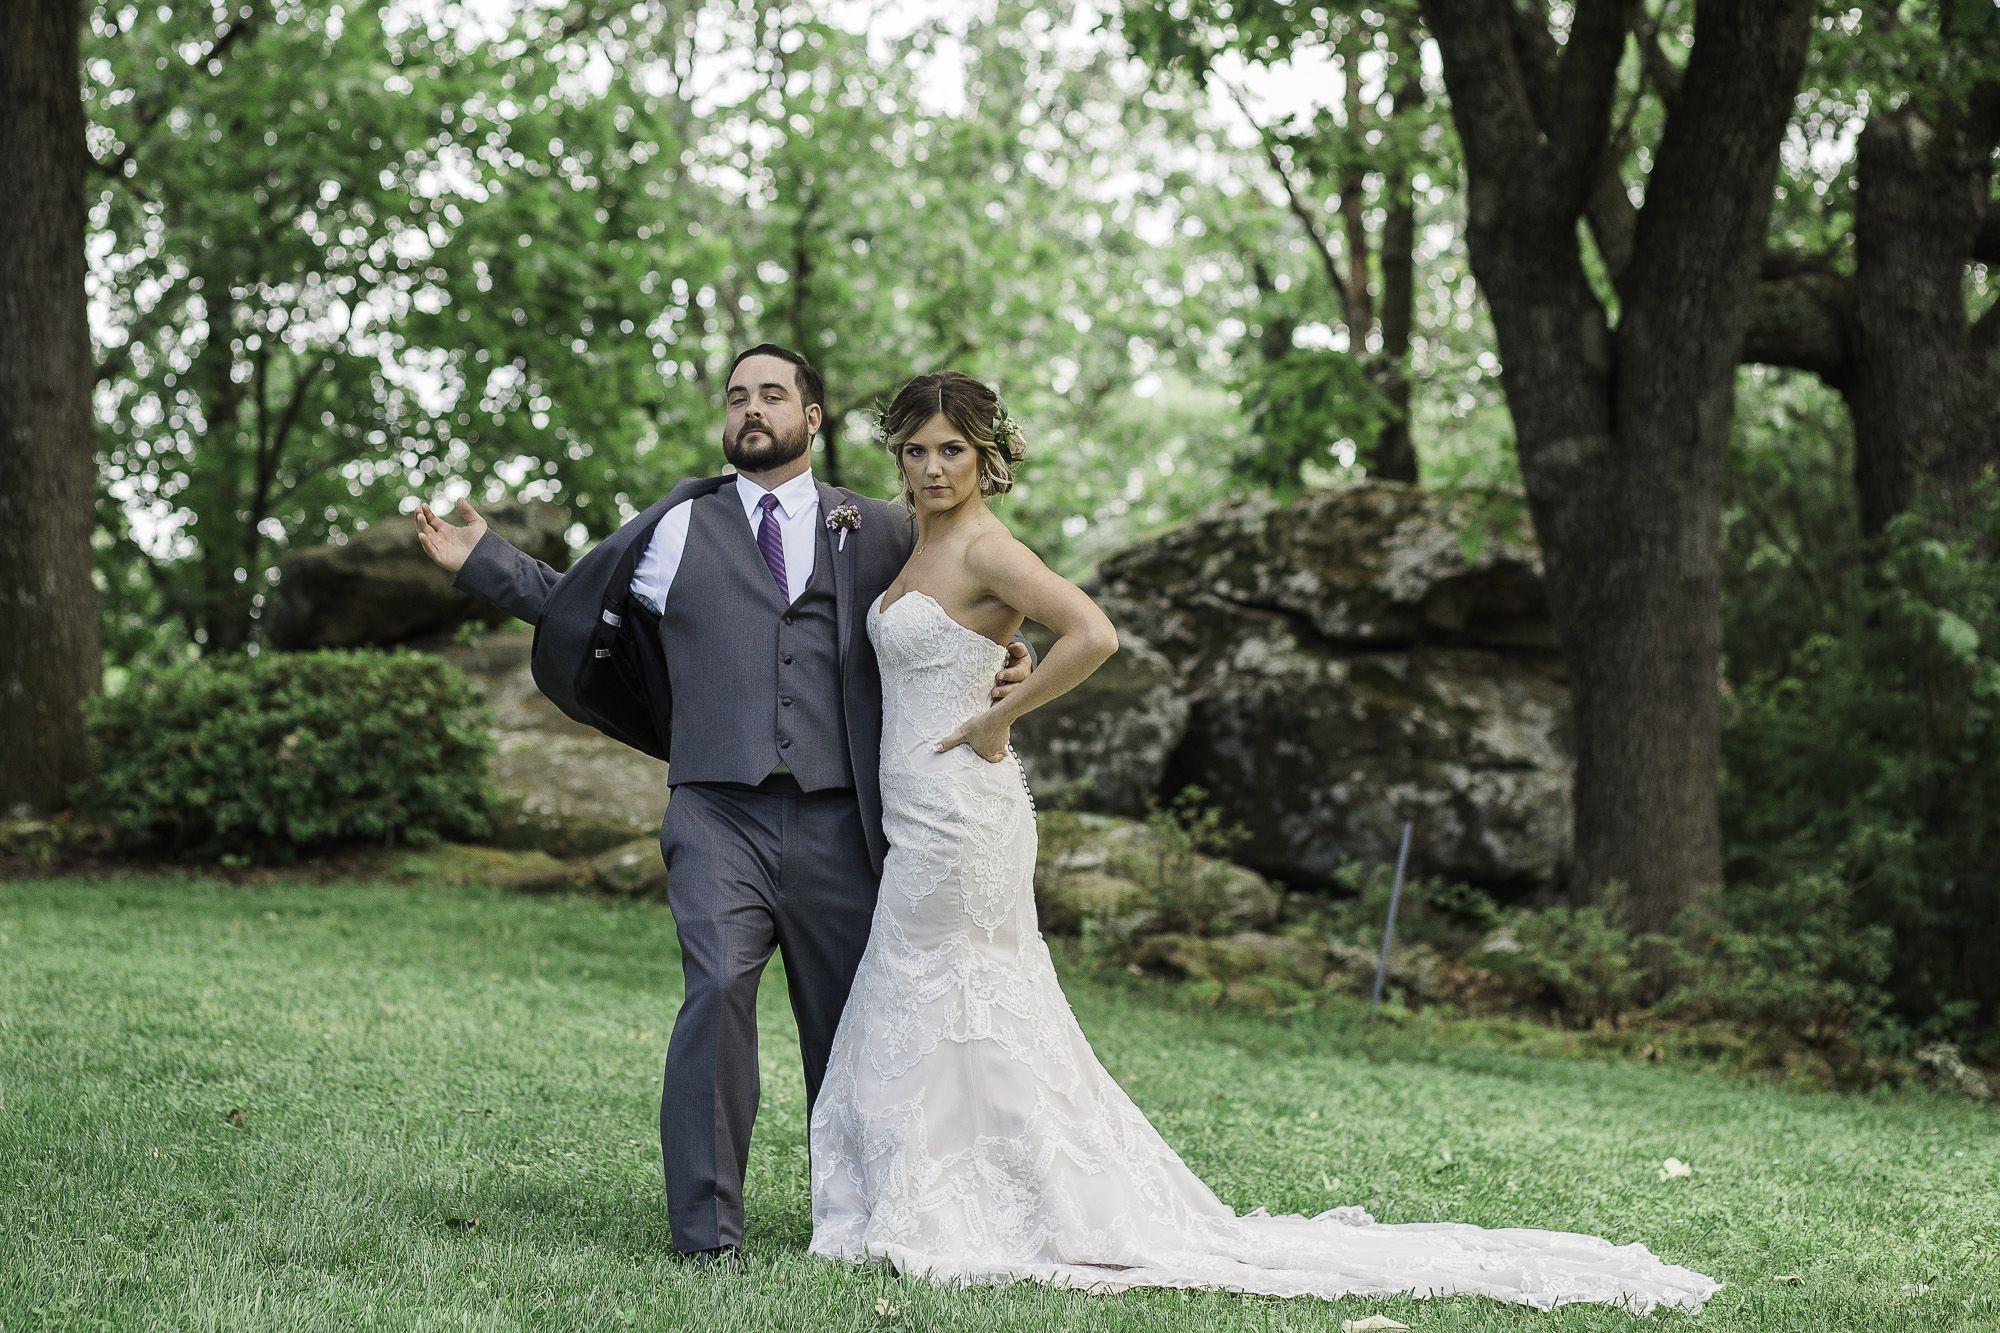 I need a dress for a spring wedding  Tulsa wedding photography  adrian birdsong photography  romantic